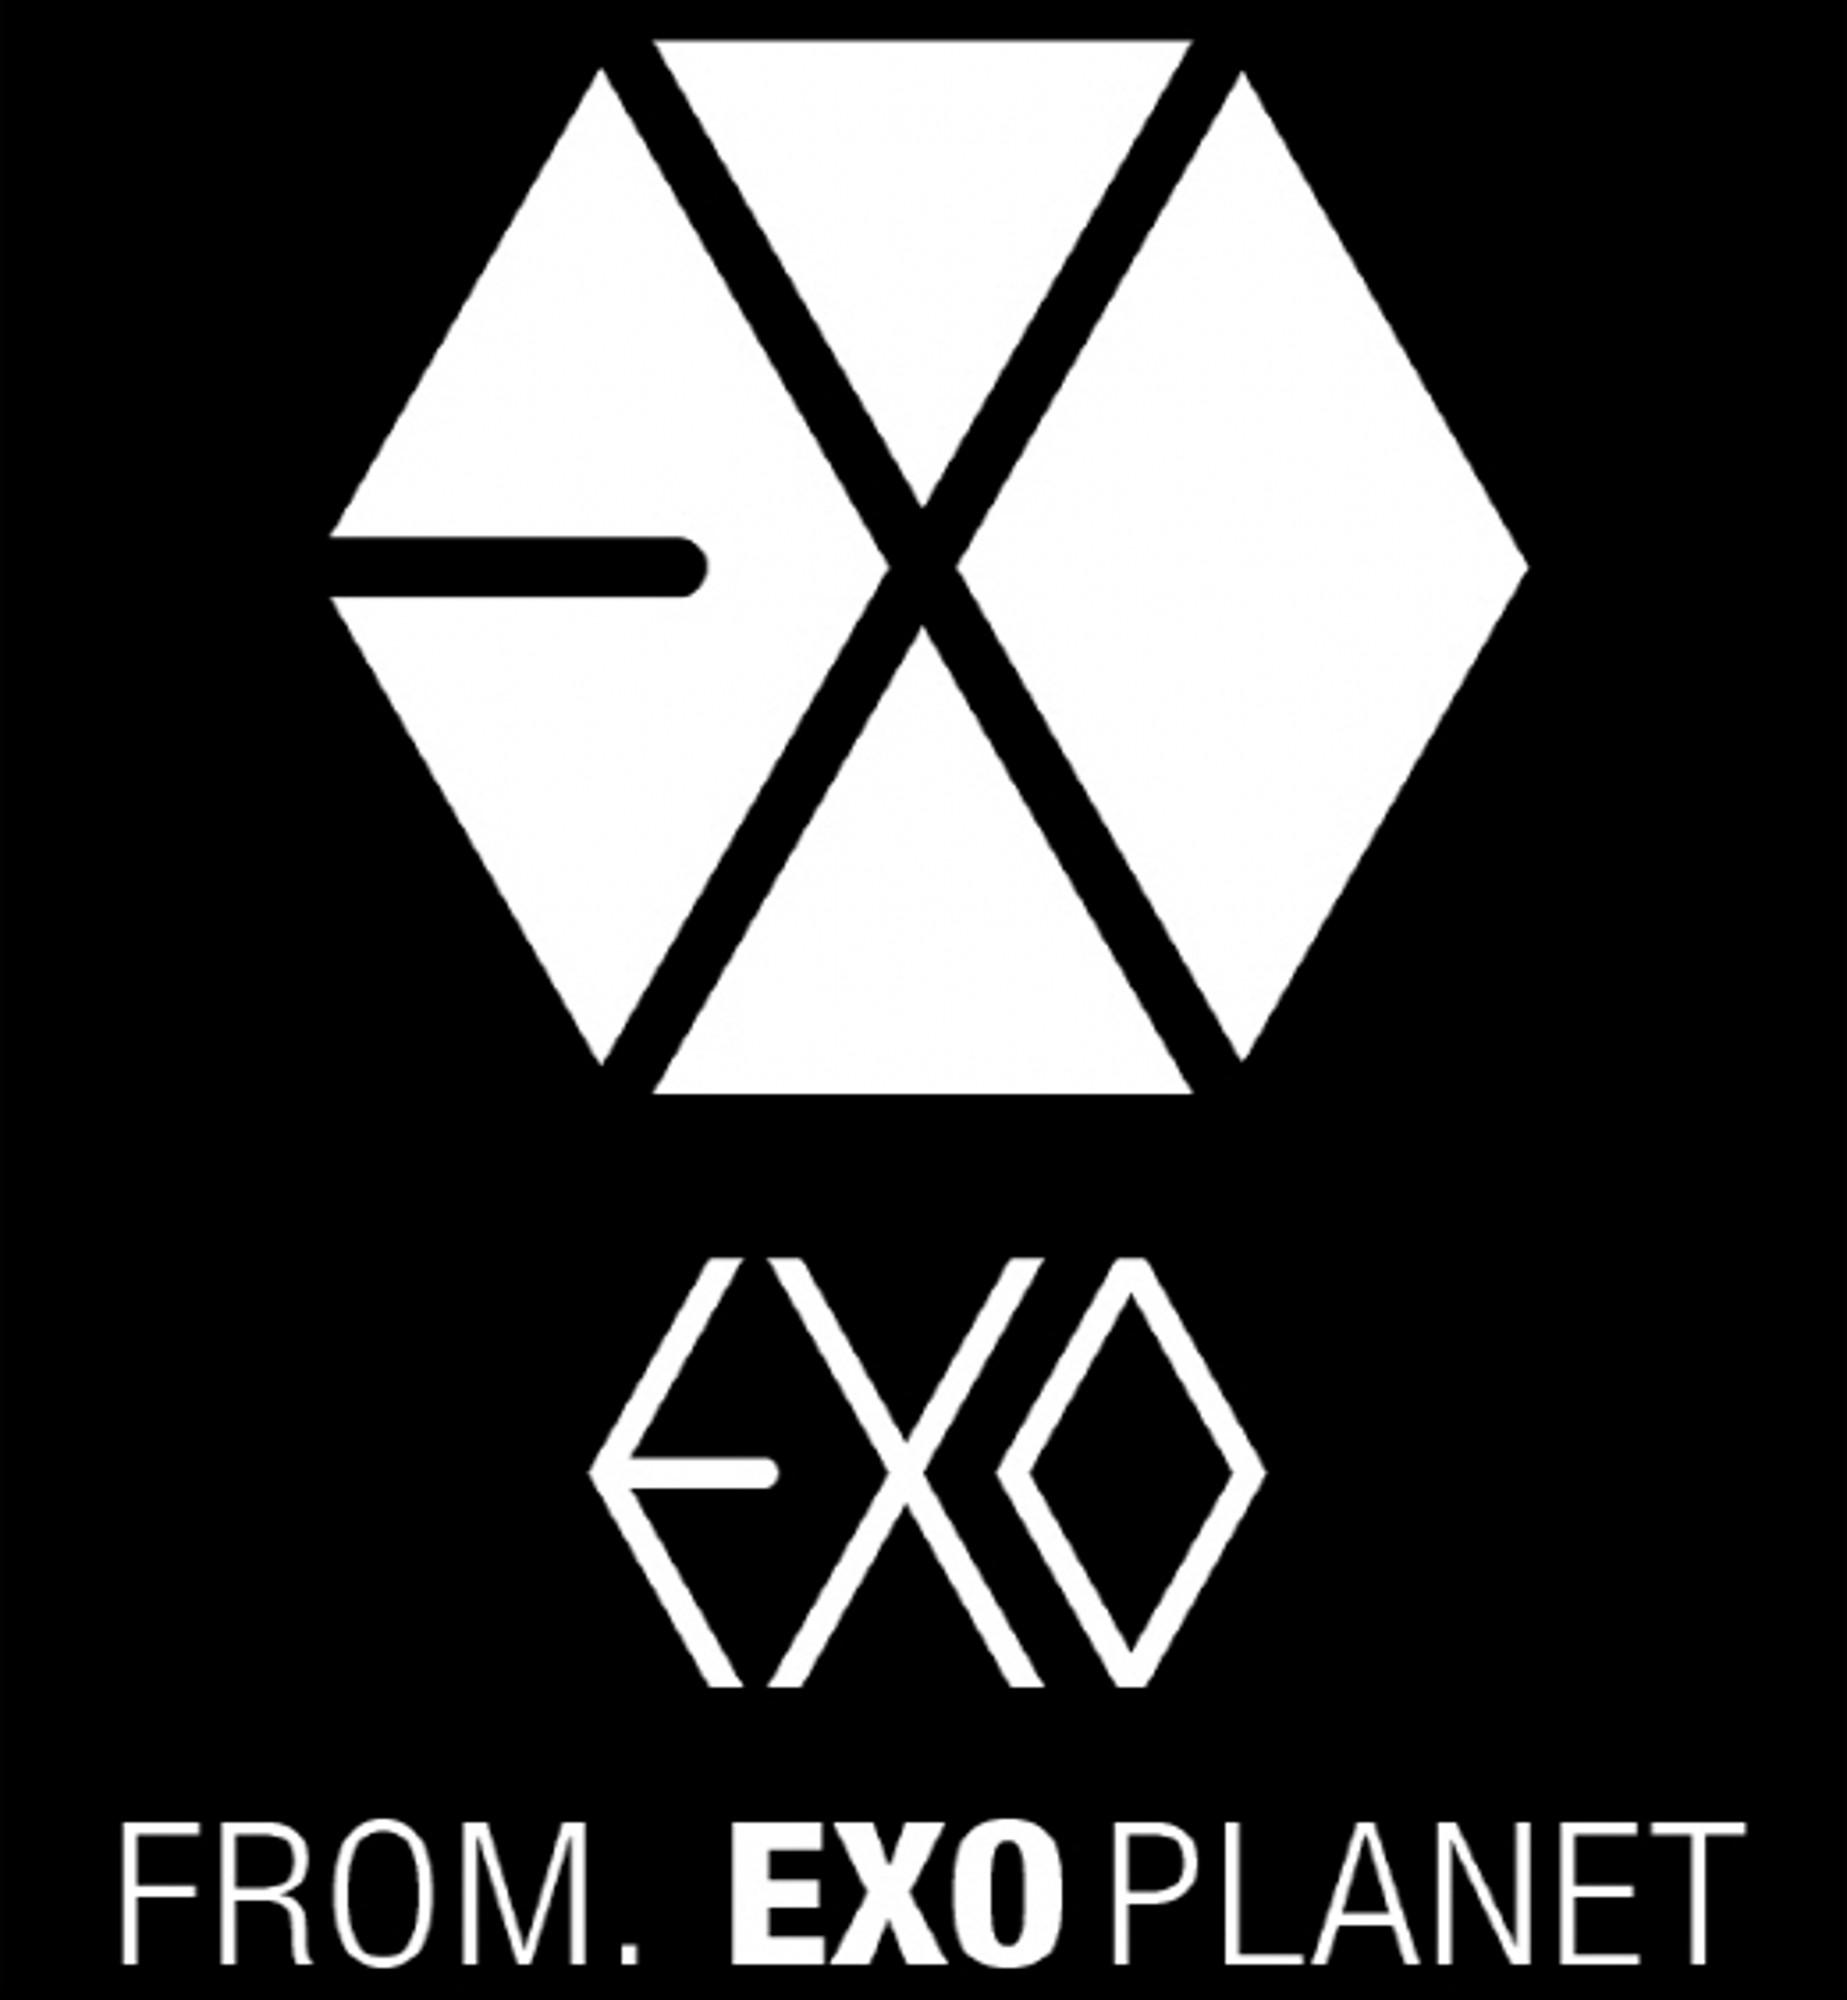 exologo高清_exo这 logo  有没有1847x2000的 高清 大图呢